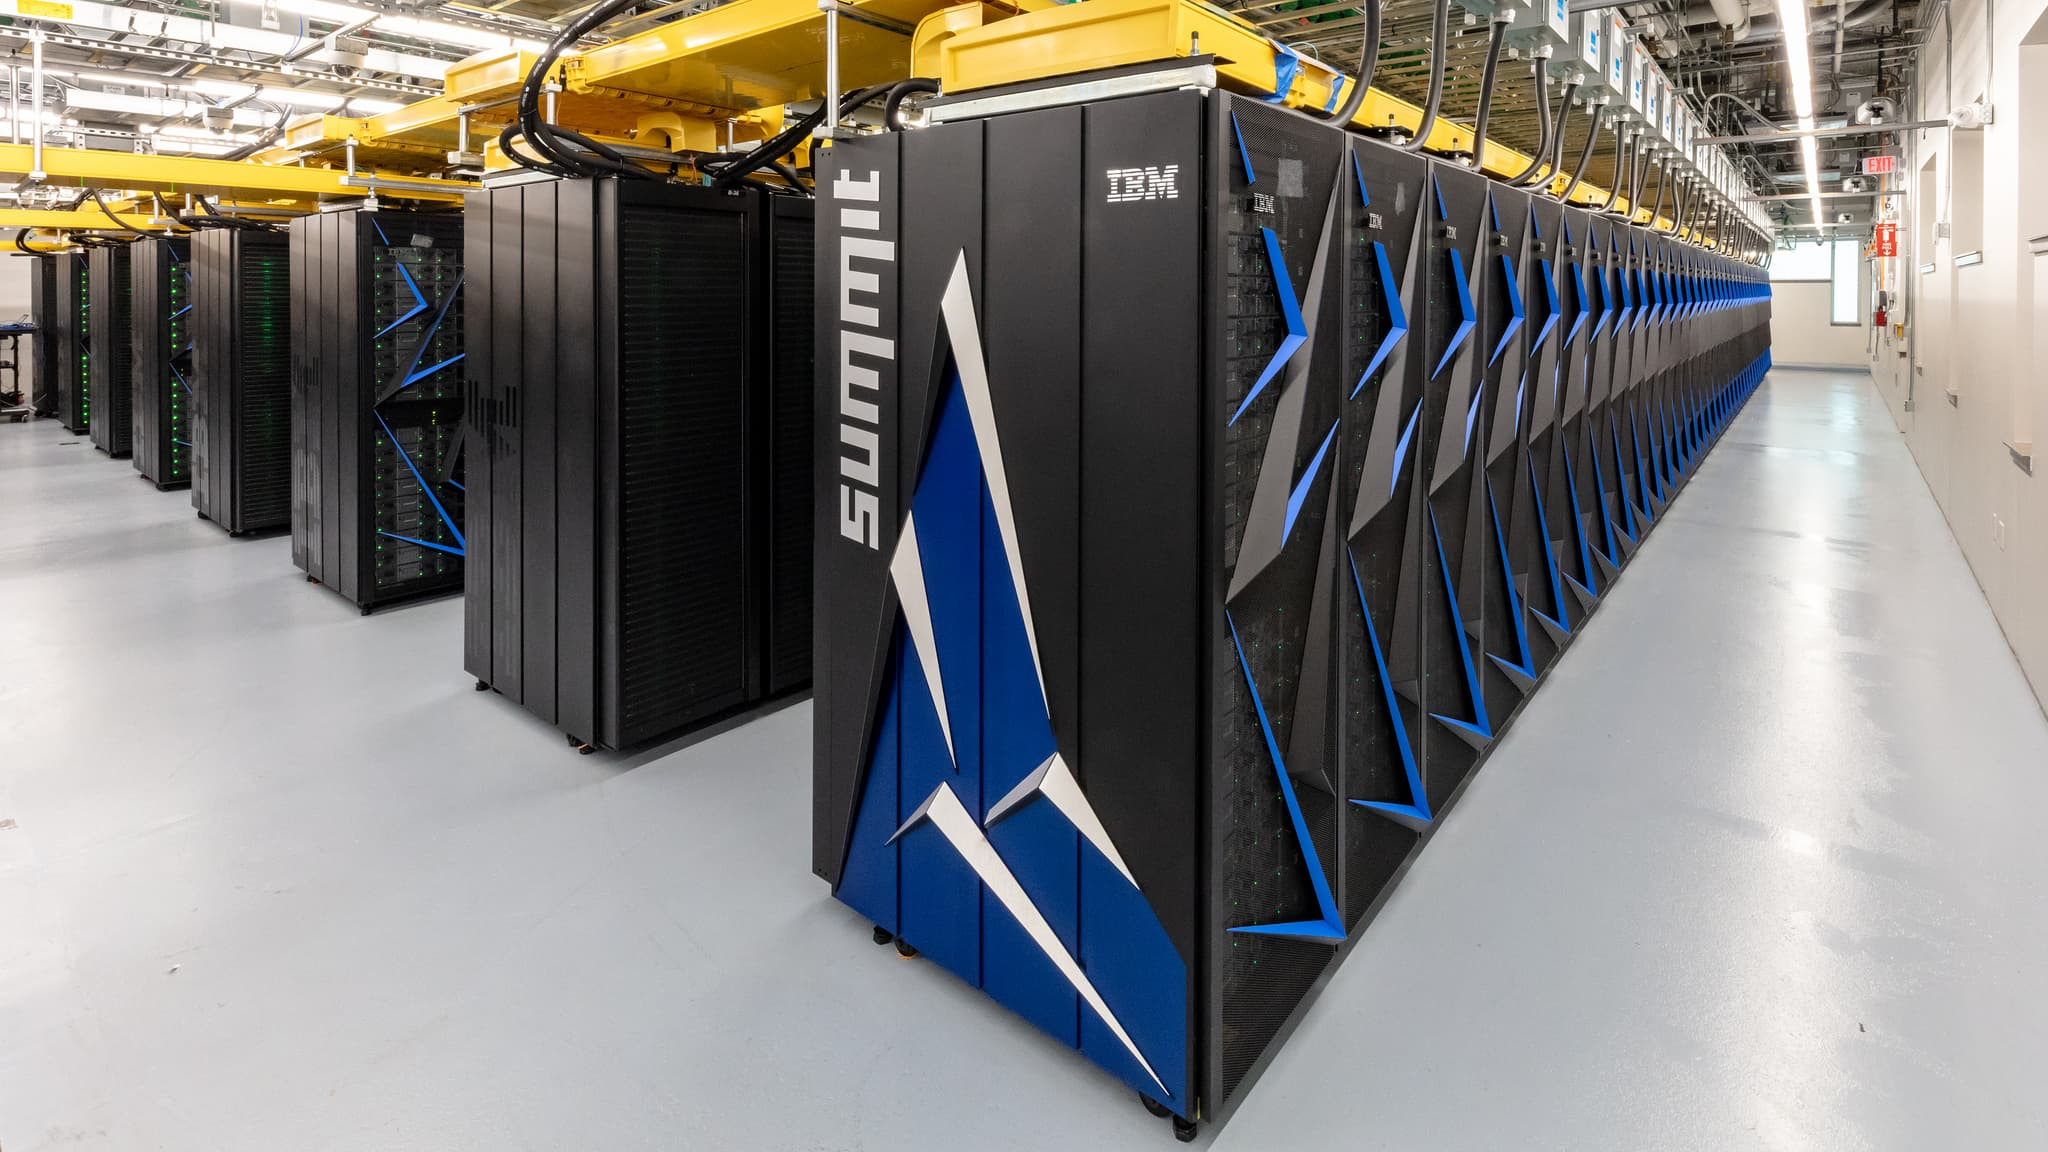 ORNL Launches Summit Supercomputer CC